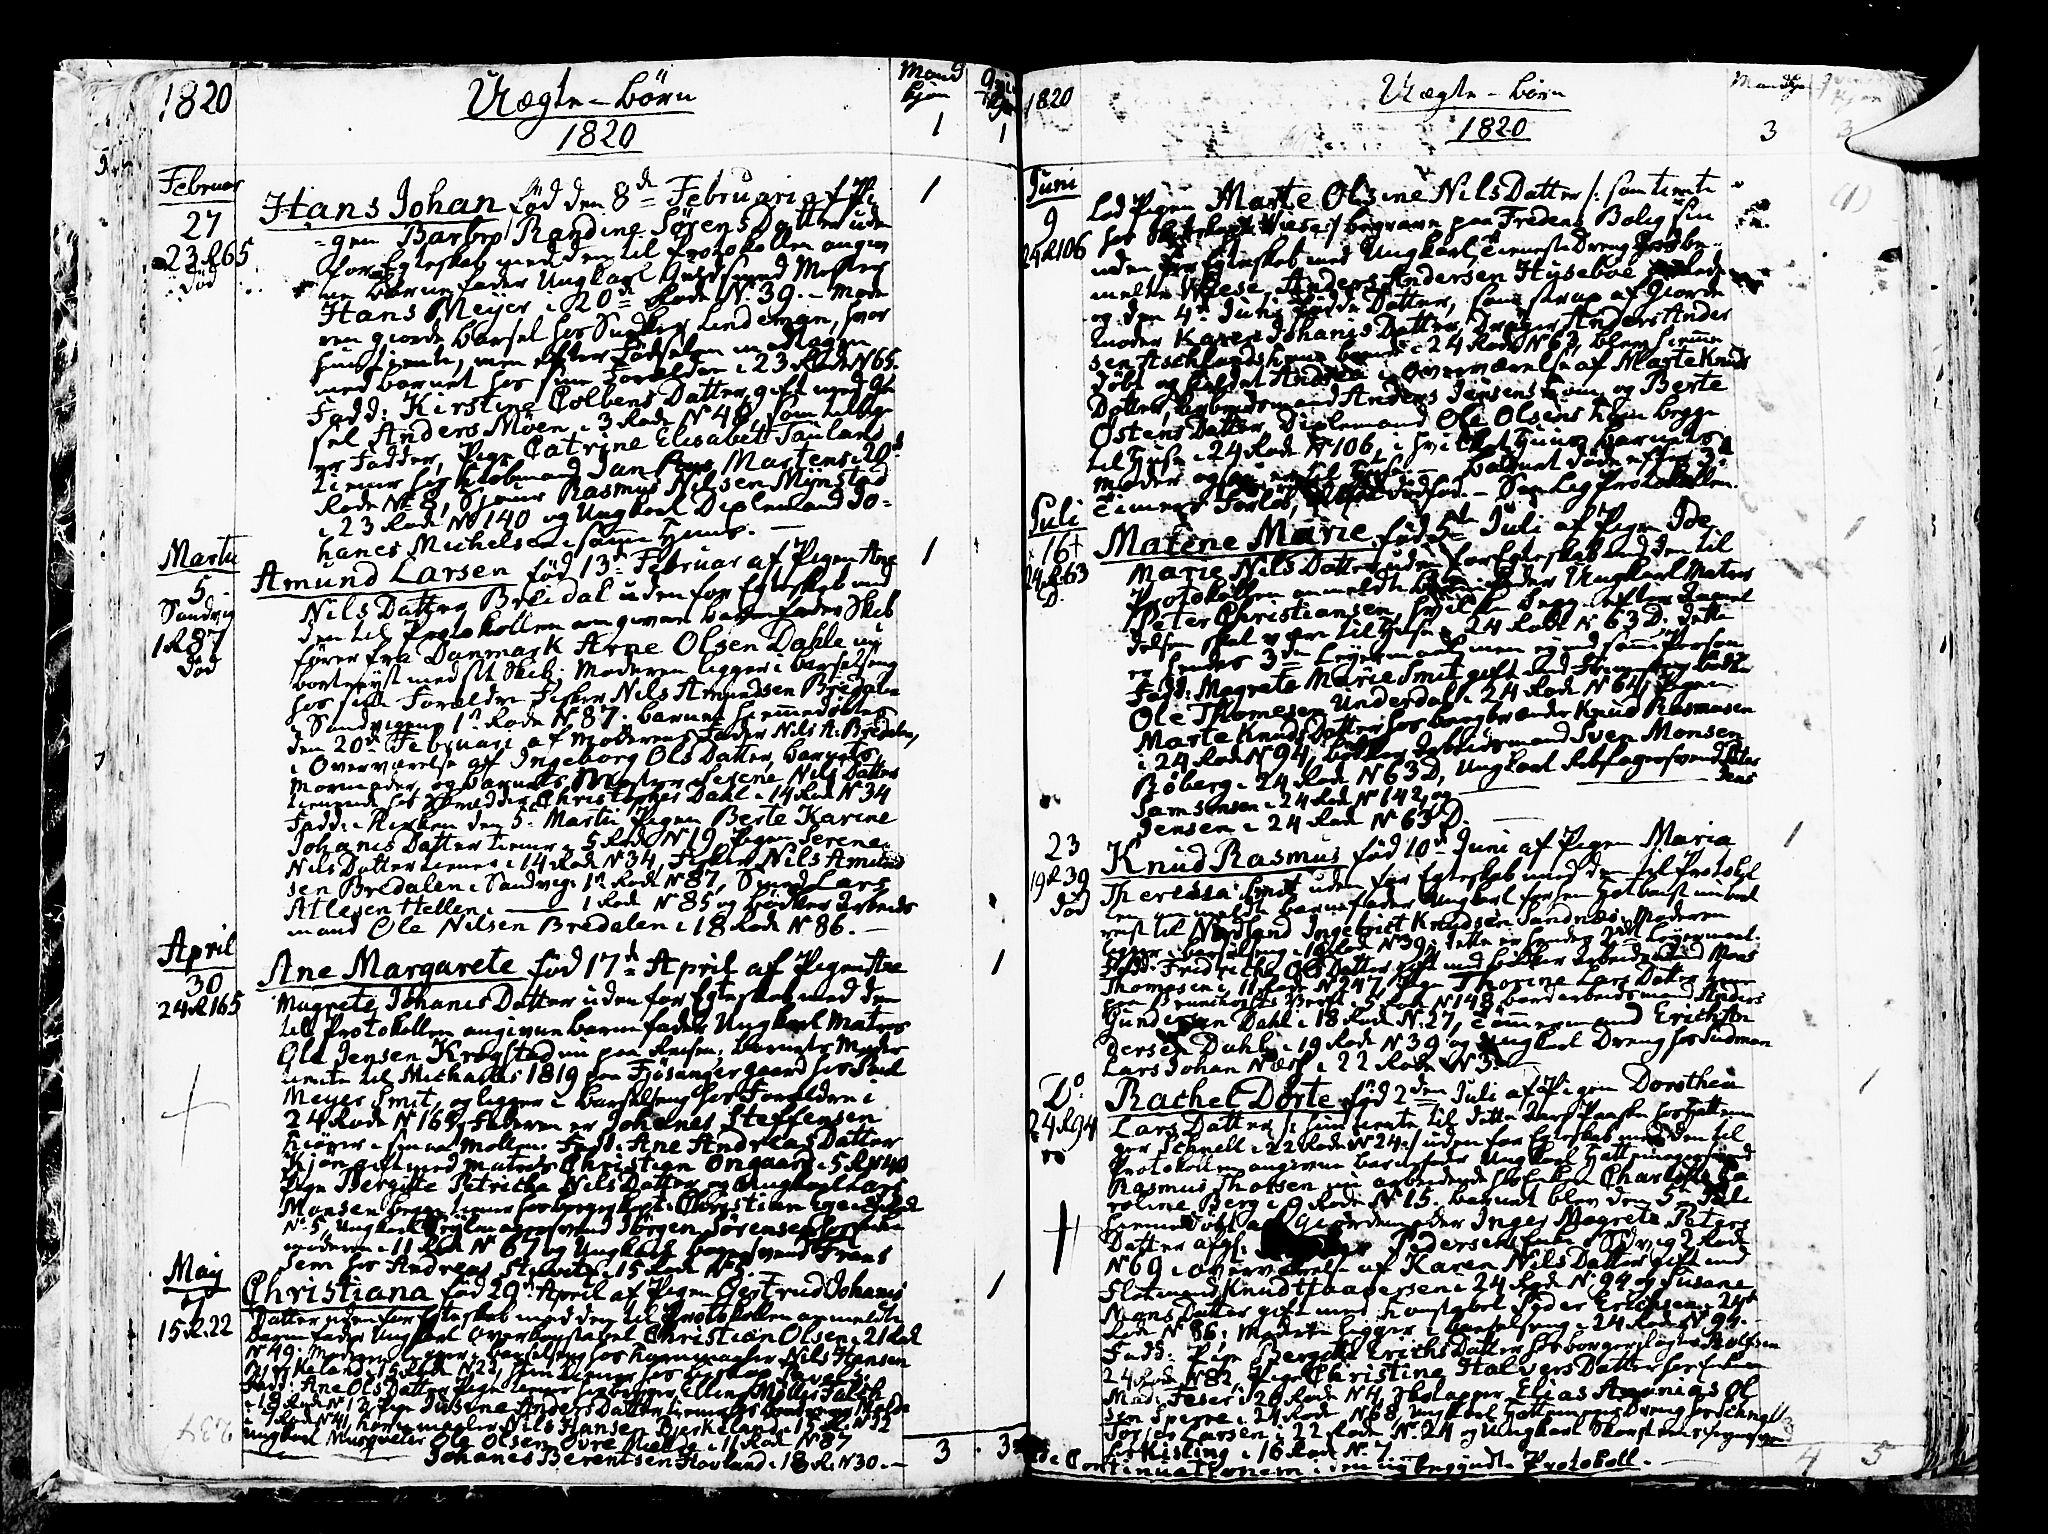 SAB, Korskirken Sokneprestembete, H/Haa/L0006: Ministerialbok nr. A 6, 1790-1820, s. 234